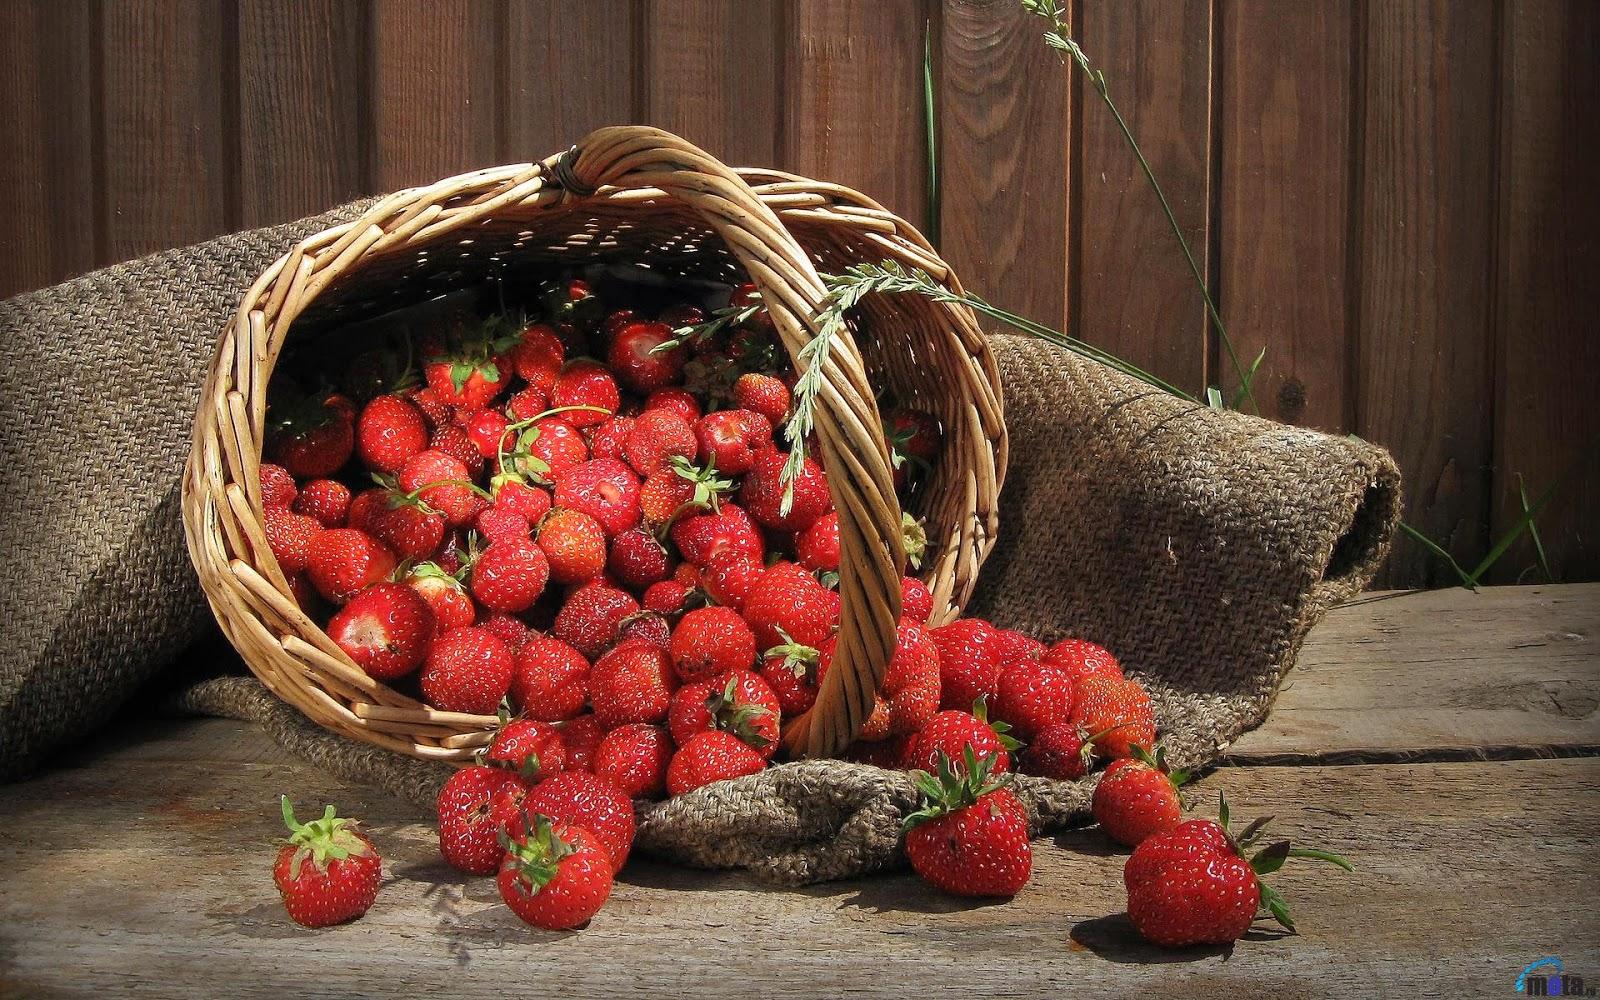 "<img src=""http://2.bp.blogspot.com/-IyJHkqY98Y0/UuqwYc372fI/AAAAAAAAKuQ/WZjNn-77Qi0/s1600/strawberry-wallpaper.jpg"" alt=""strawberry wallpaper"" />"